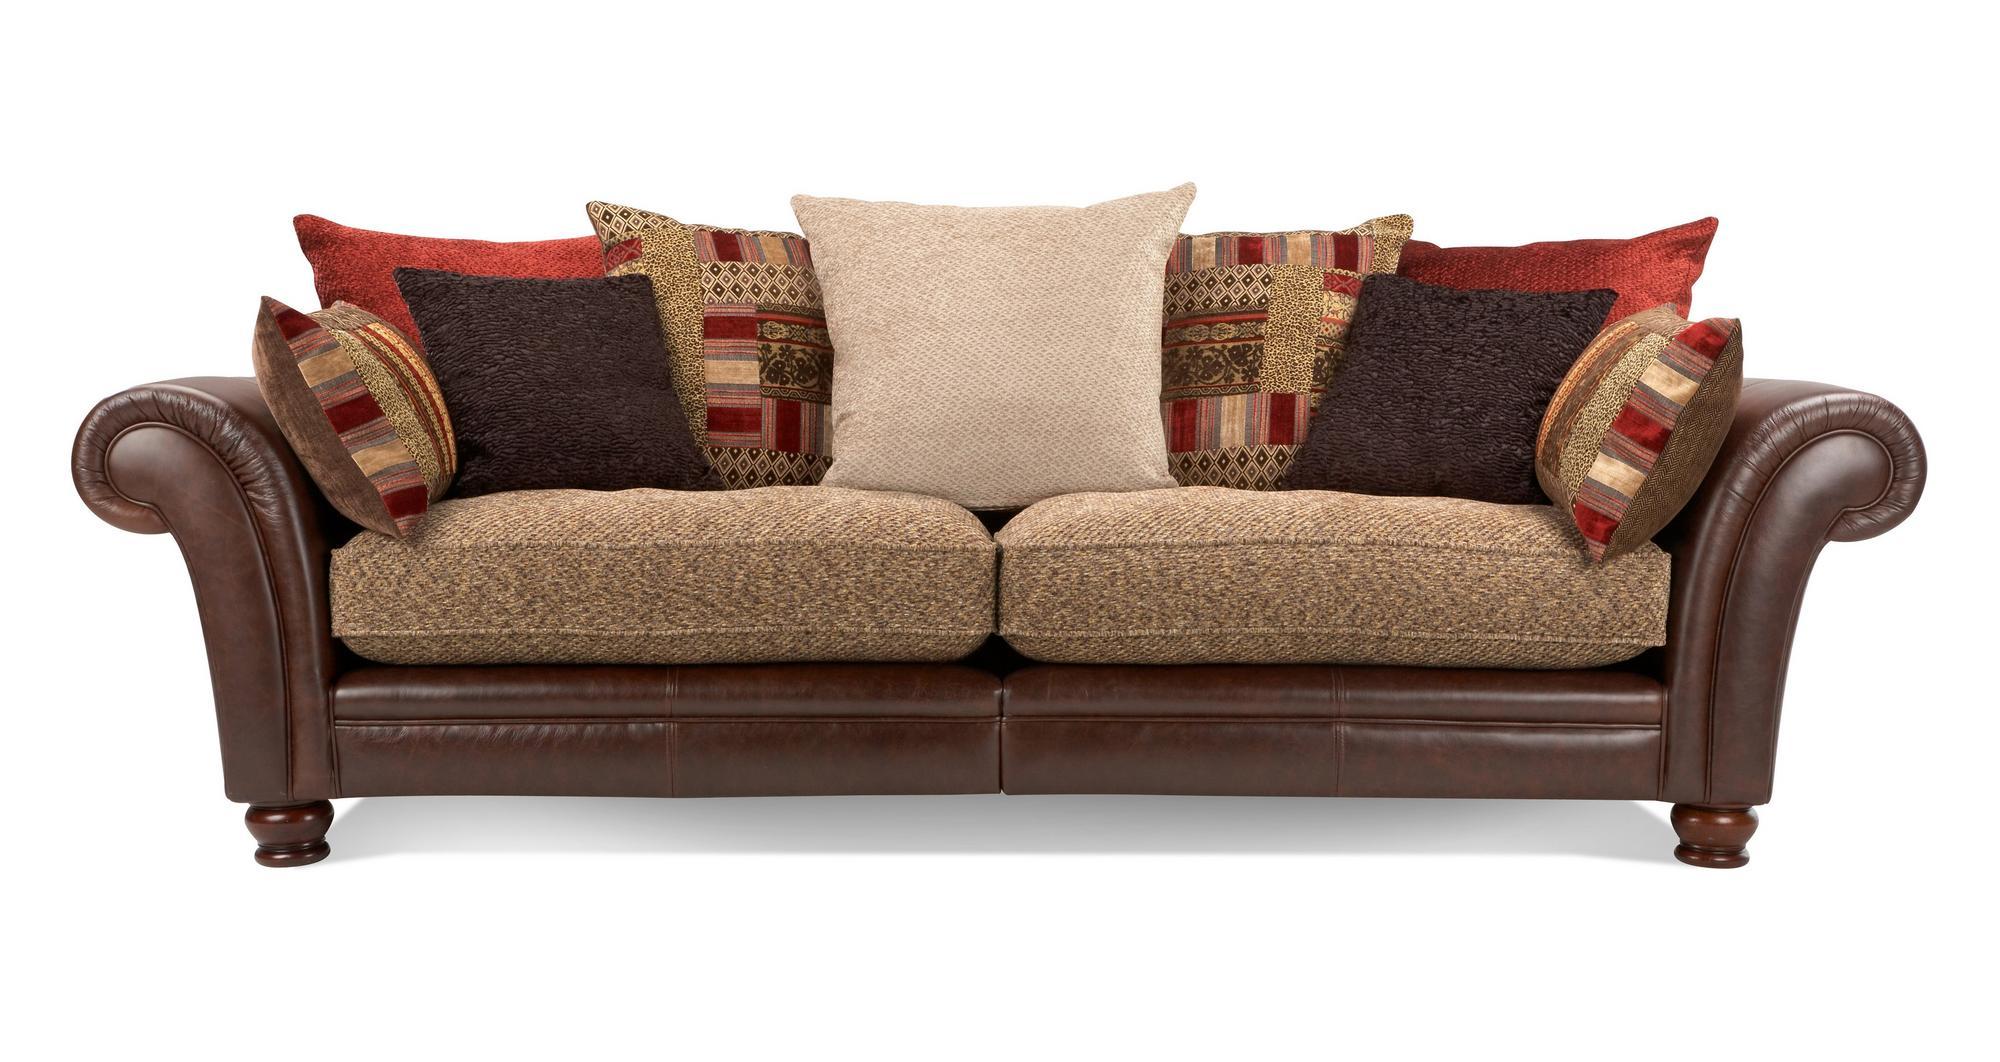 Peachy Dfs Perez Brown Fabric 4 Seater 2 Seater Armchair Bralicious Painted Fabric Chair Ideas Braliciousco